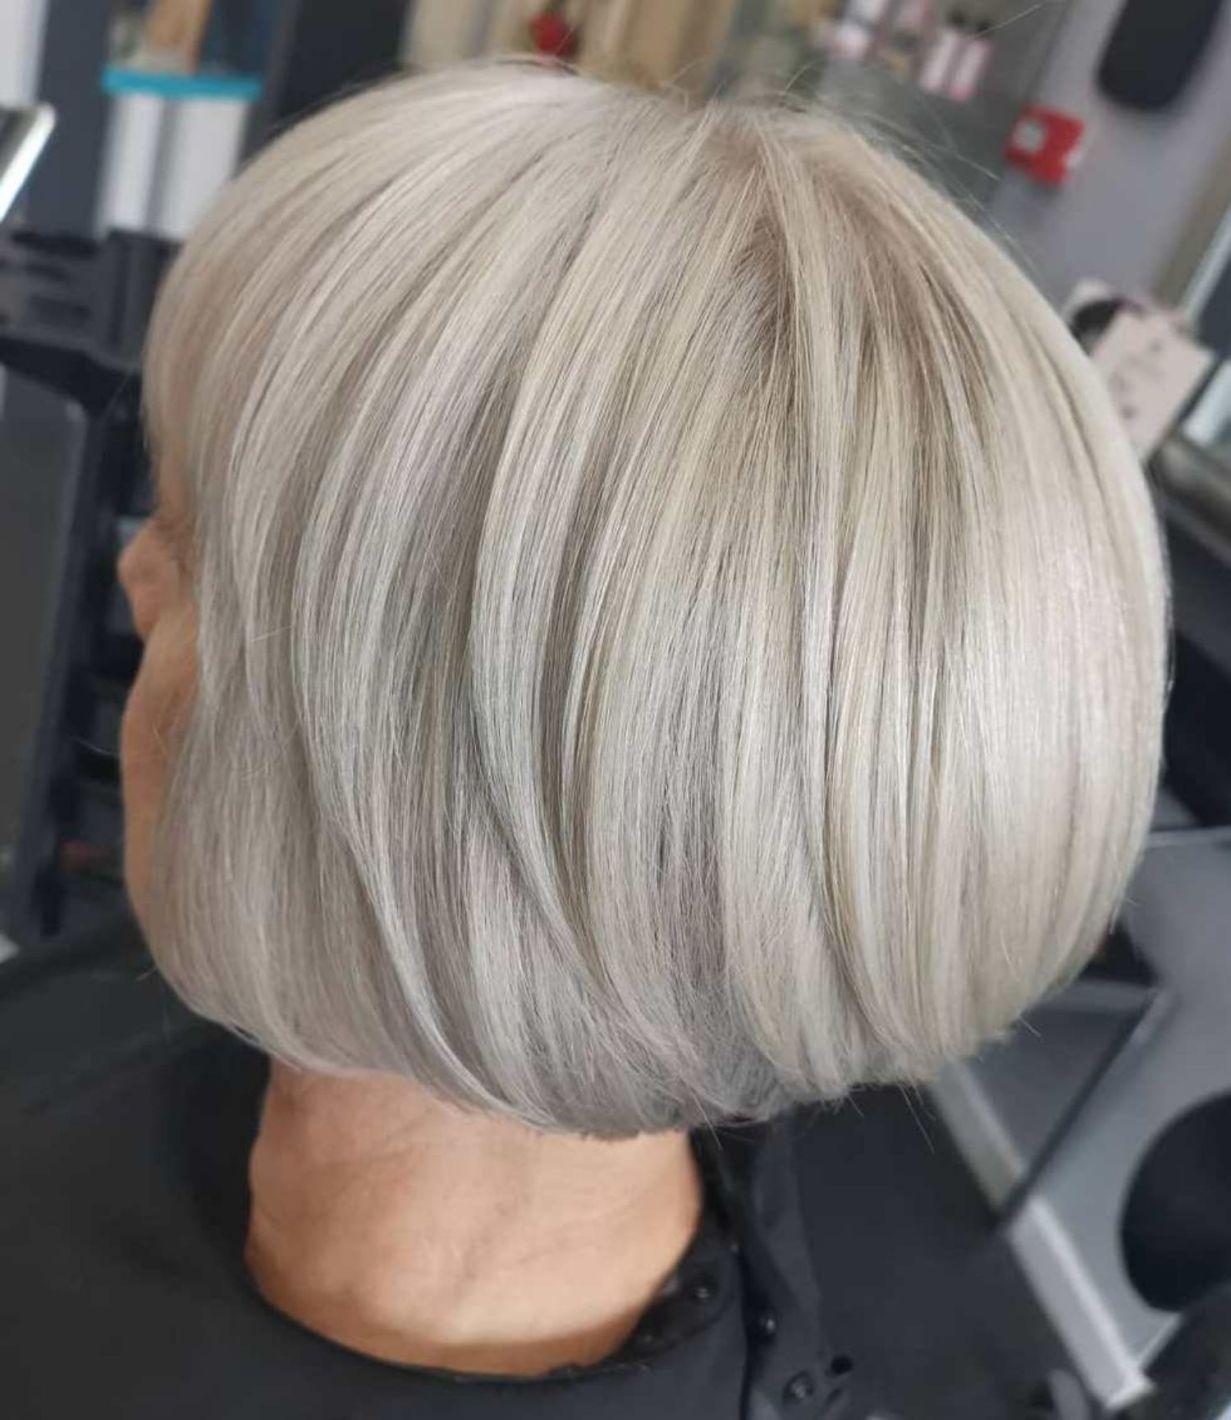 Chic Rounded White Blonde Bob Bob Kapsel Grijs Haar Grijs Haar Kapsels Kort Haar Kapsel